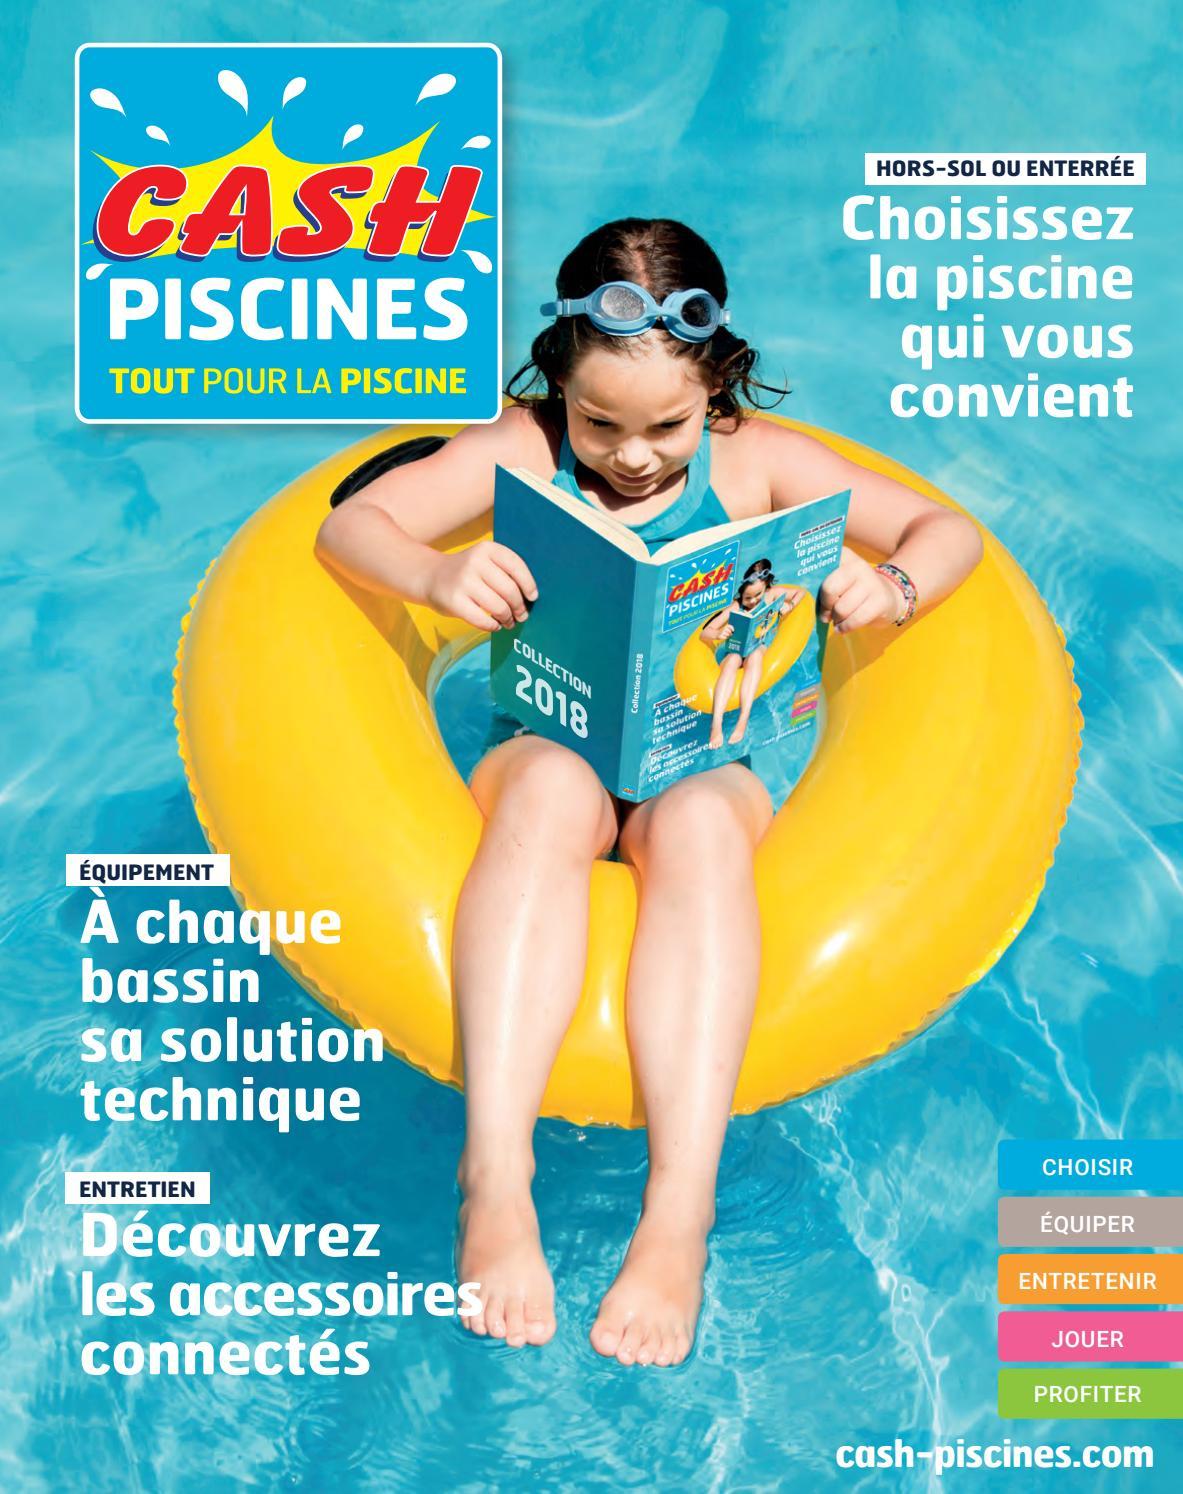 Catalogue Cash Piscine 2018 By Octave Octave - Issuu dedans Cash Piscine Dijon